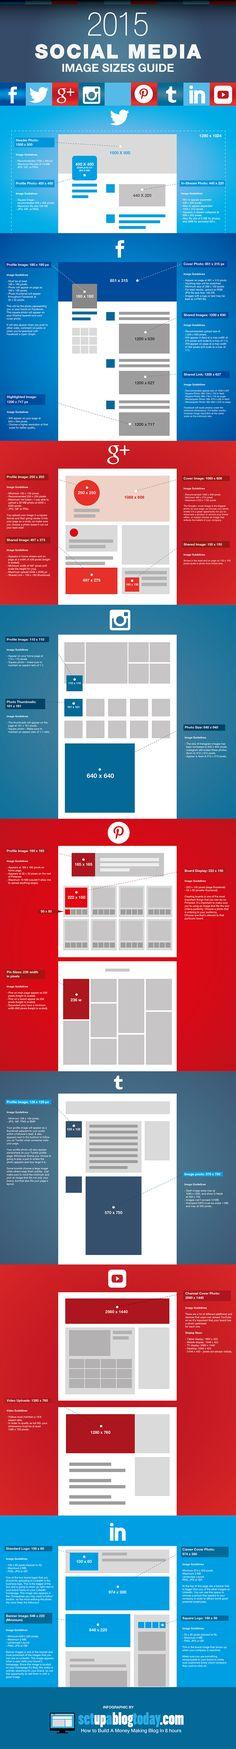 2015 Social Media Image Sizes Guide